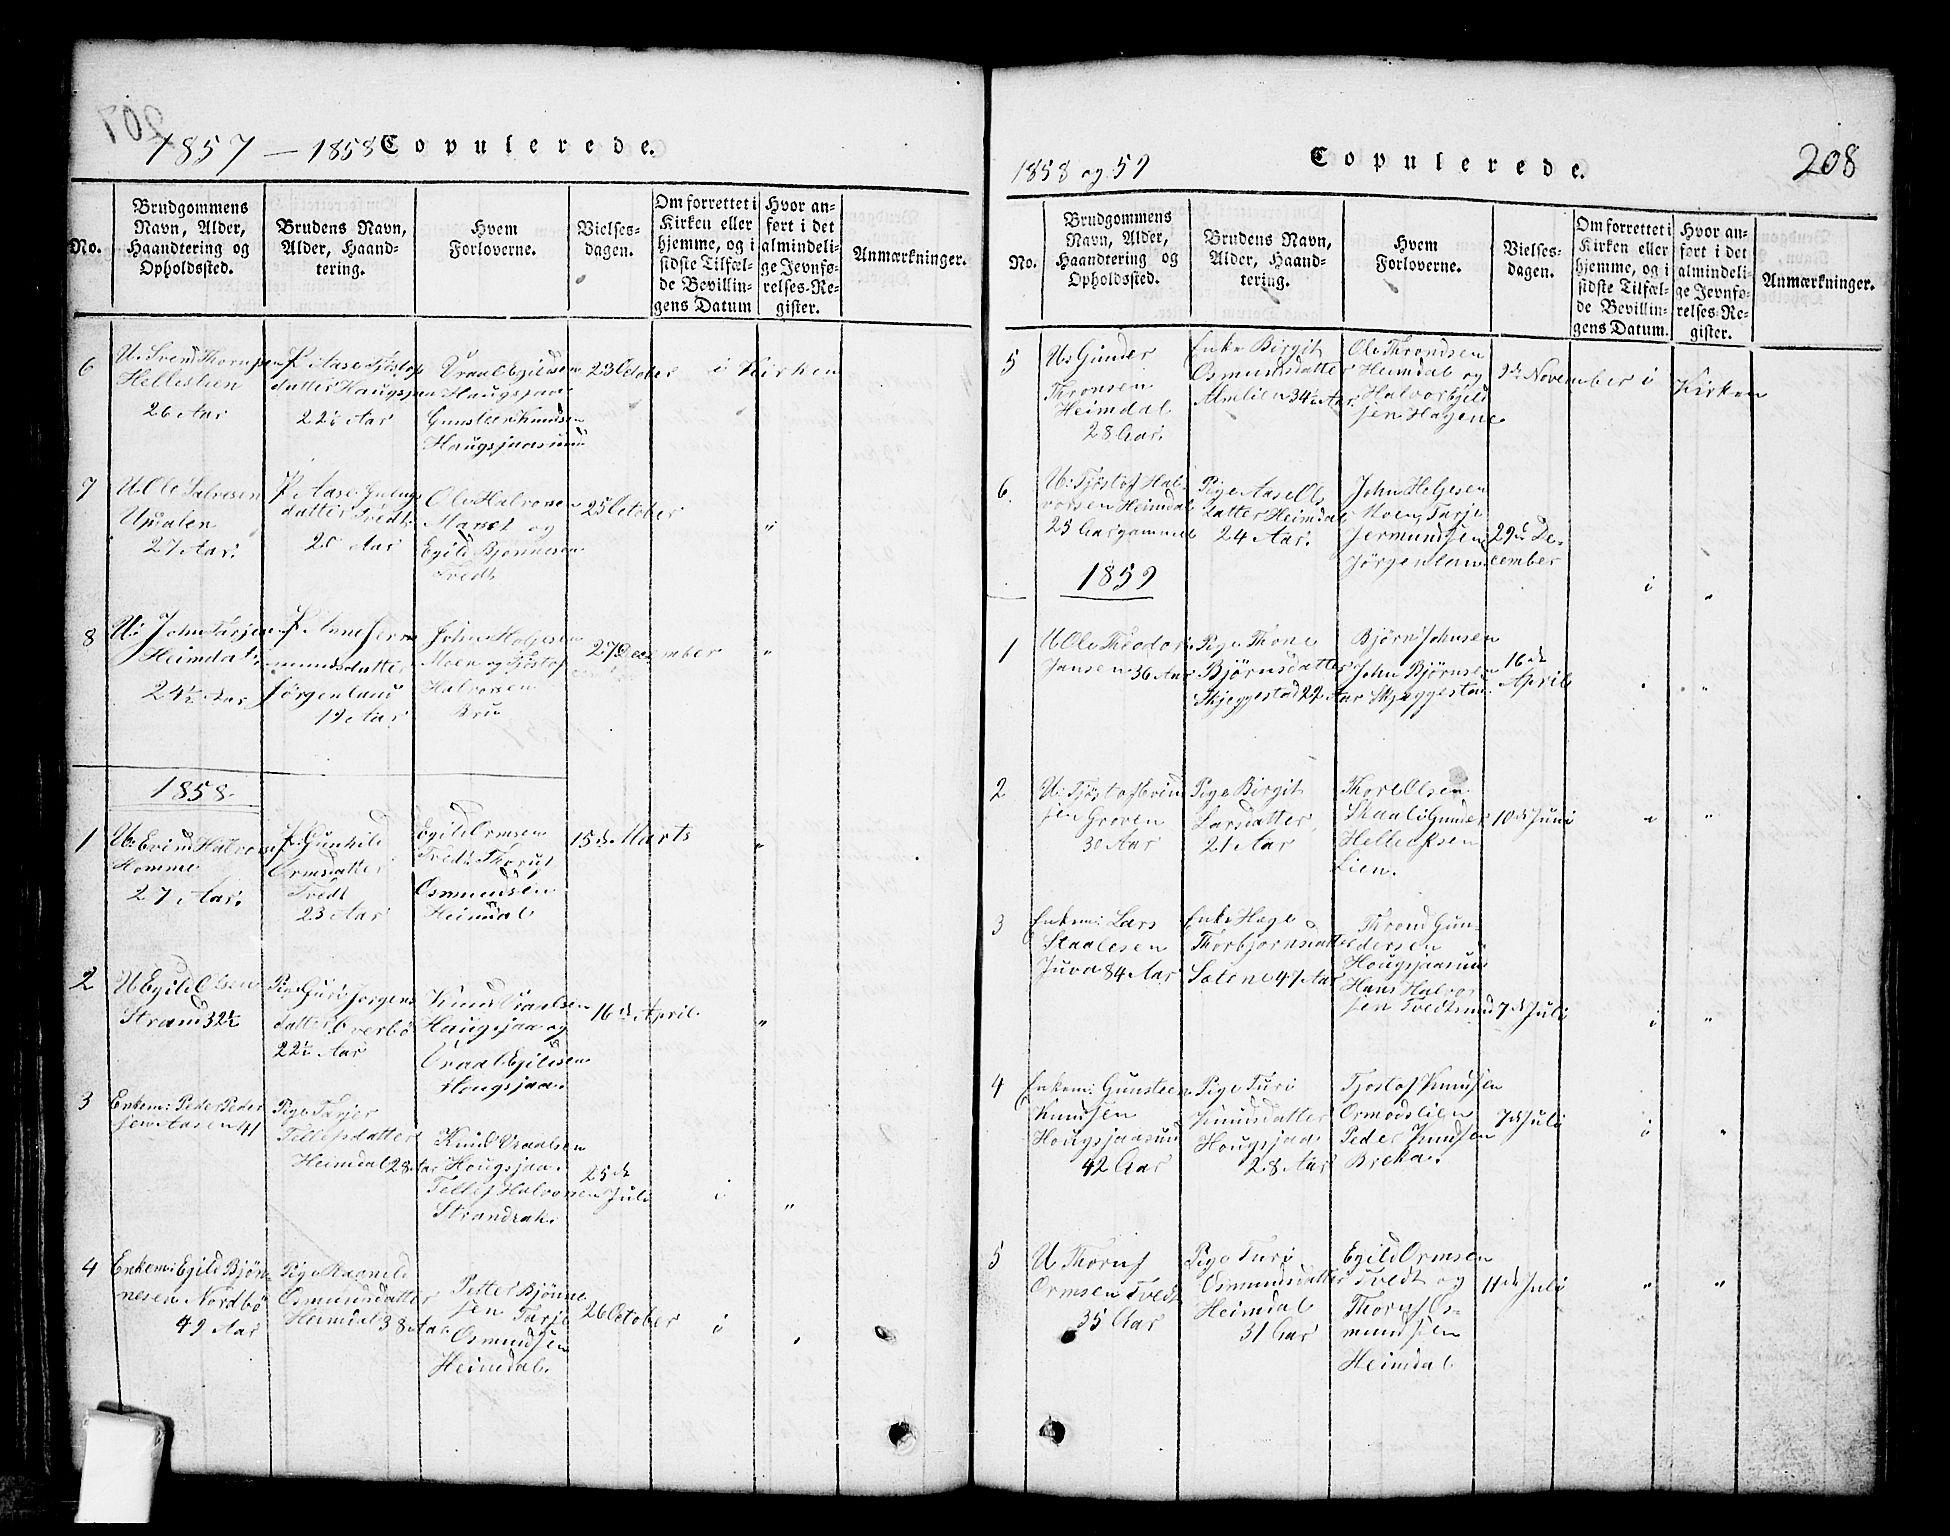 SAKO, Nissedal kirkebøker, G/Gb/L0001: Klokkerbok nr. II 1, 1814-1862, s. 208